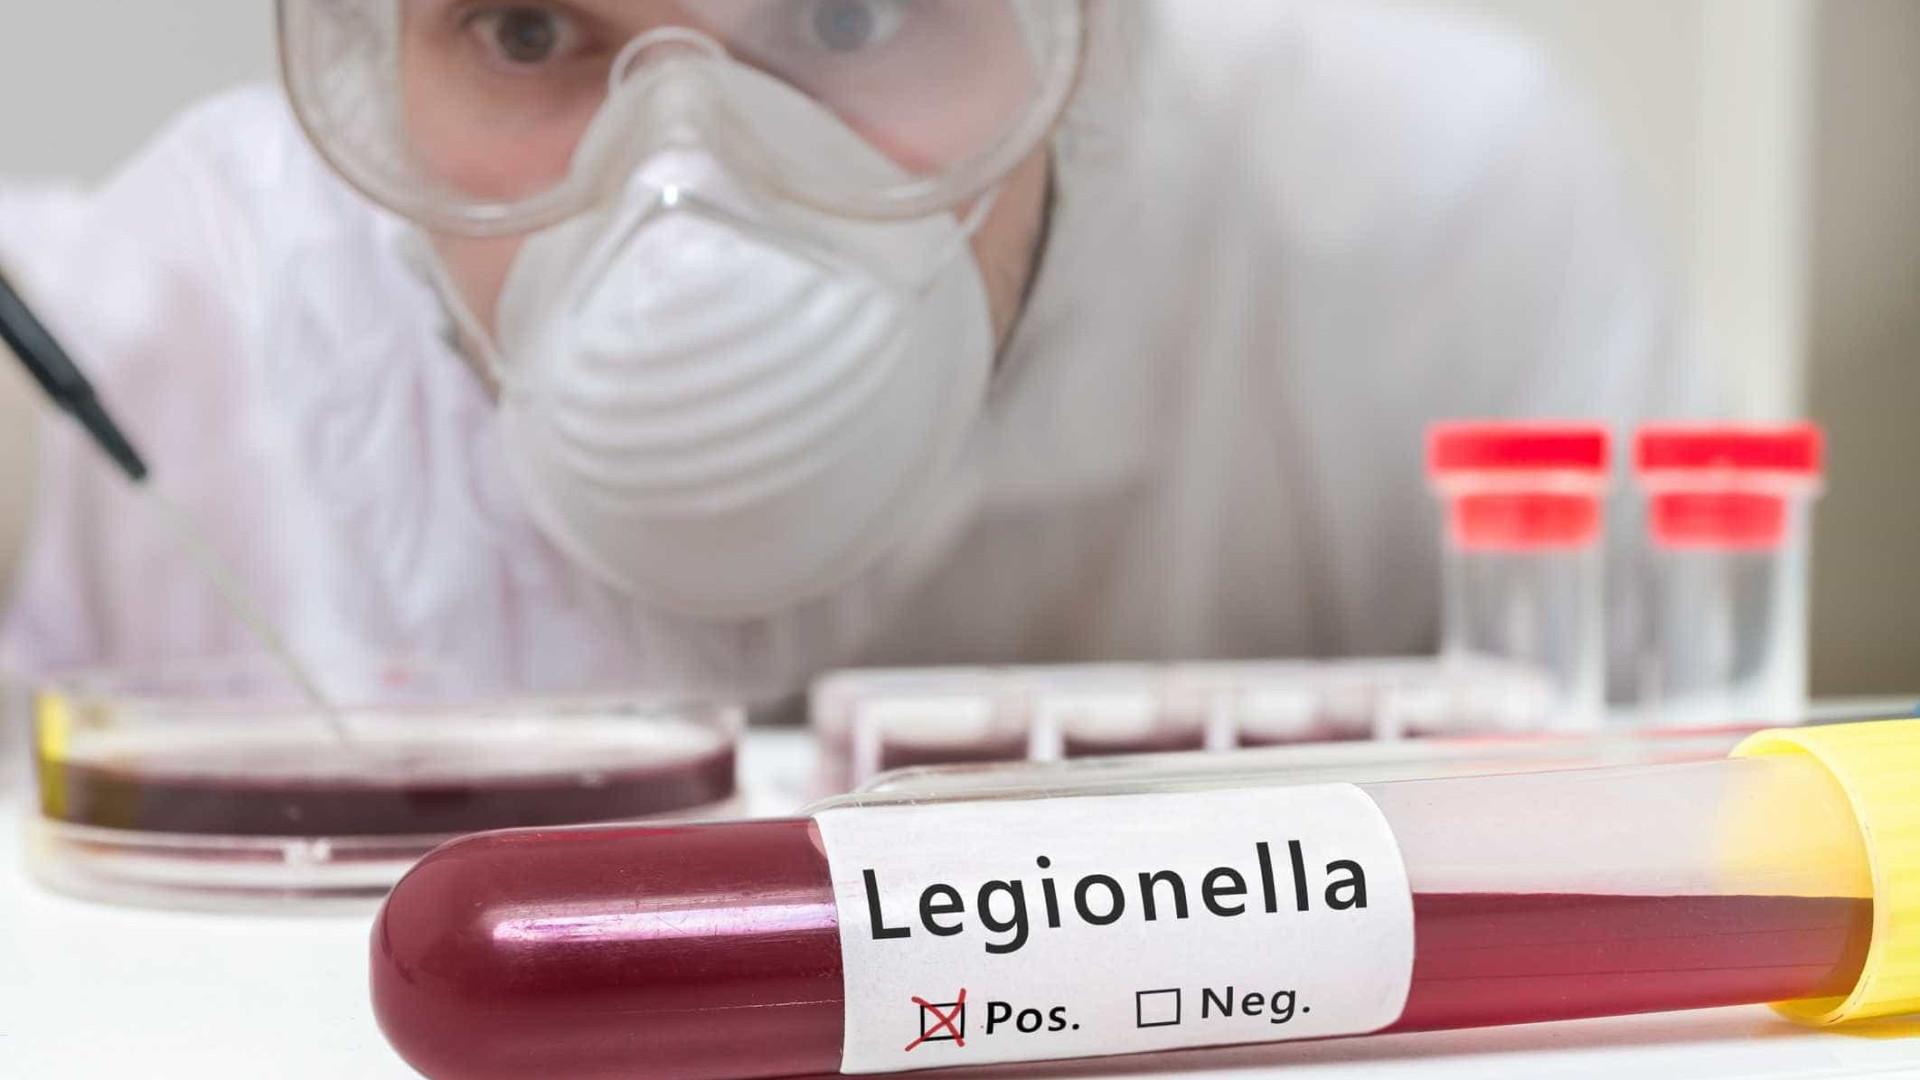 Legionella volta a 'atacar': Quatro mulheres infetadas na CUF Descobertas